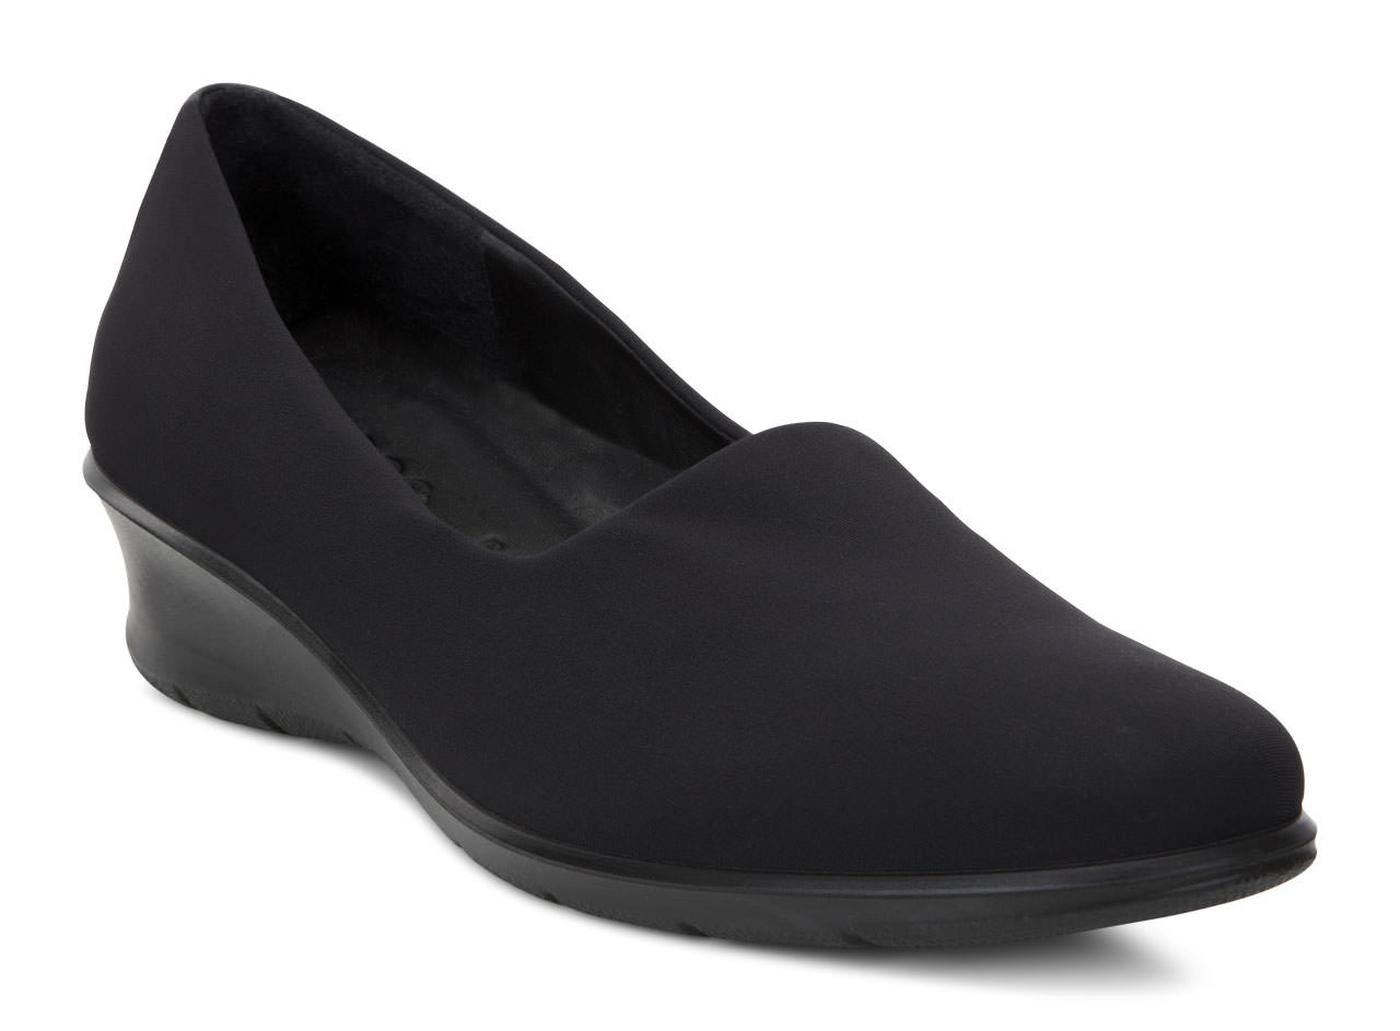 Chaussure ECCO Felicia Stretch